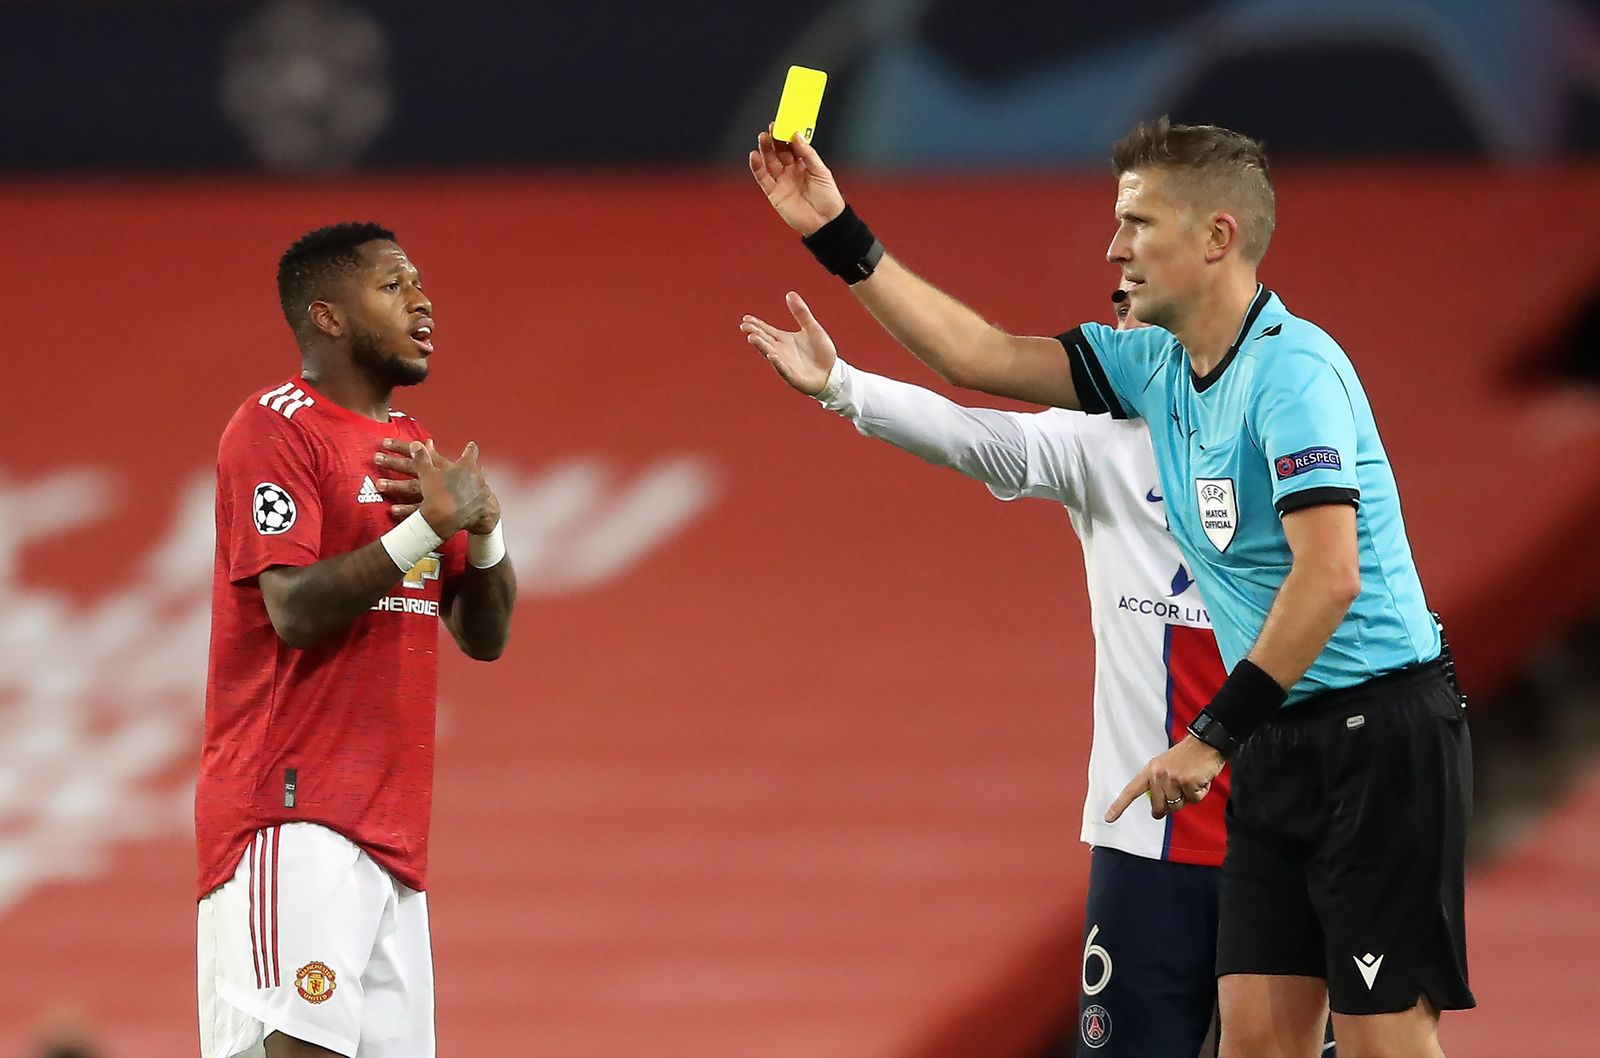 Manchester United - Paris Saint-Germain